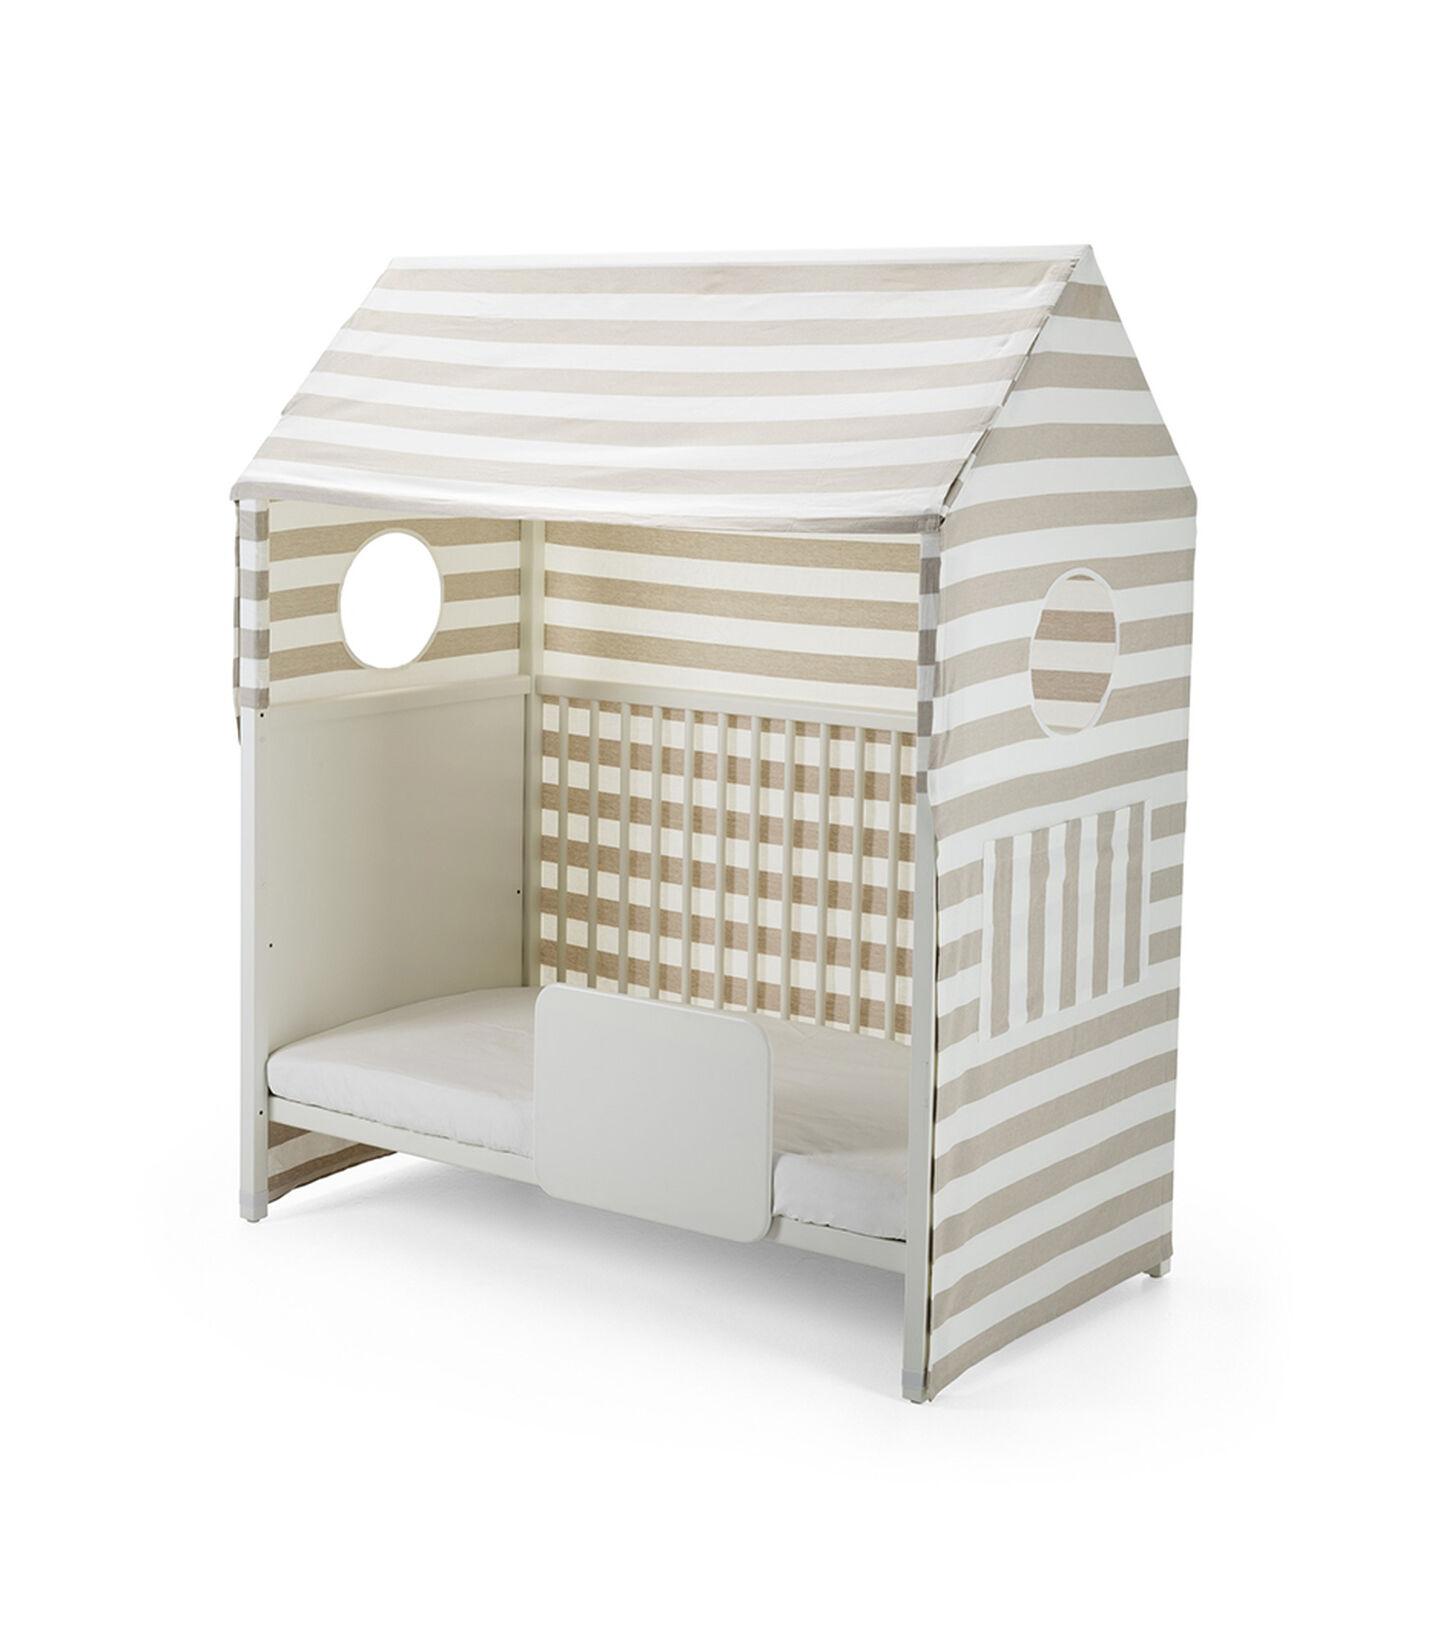 stokke home crib white. Black Bedroom Furniture Sets. Home Design Ideas